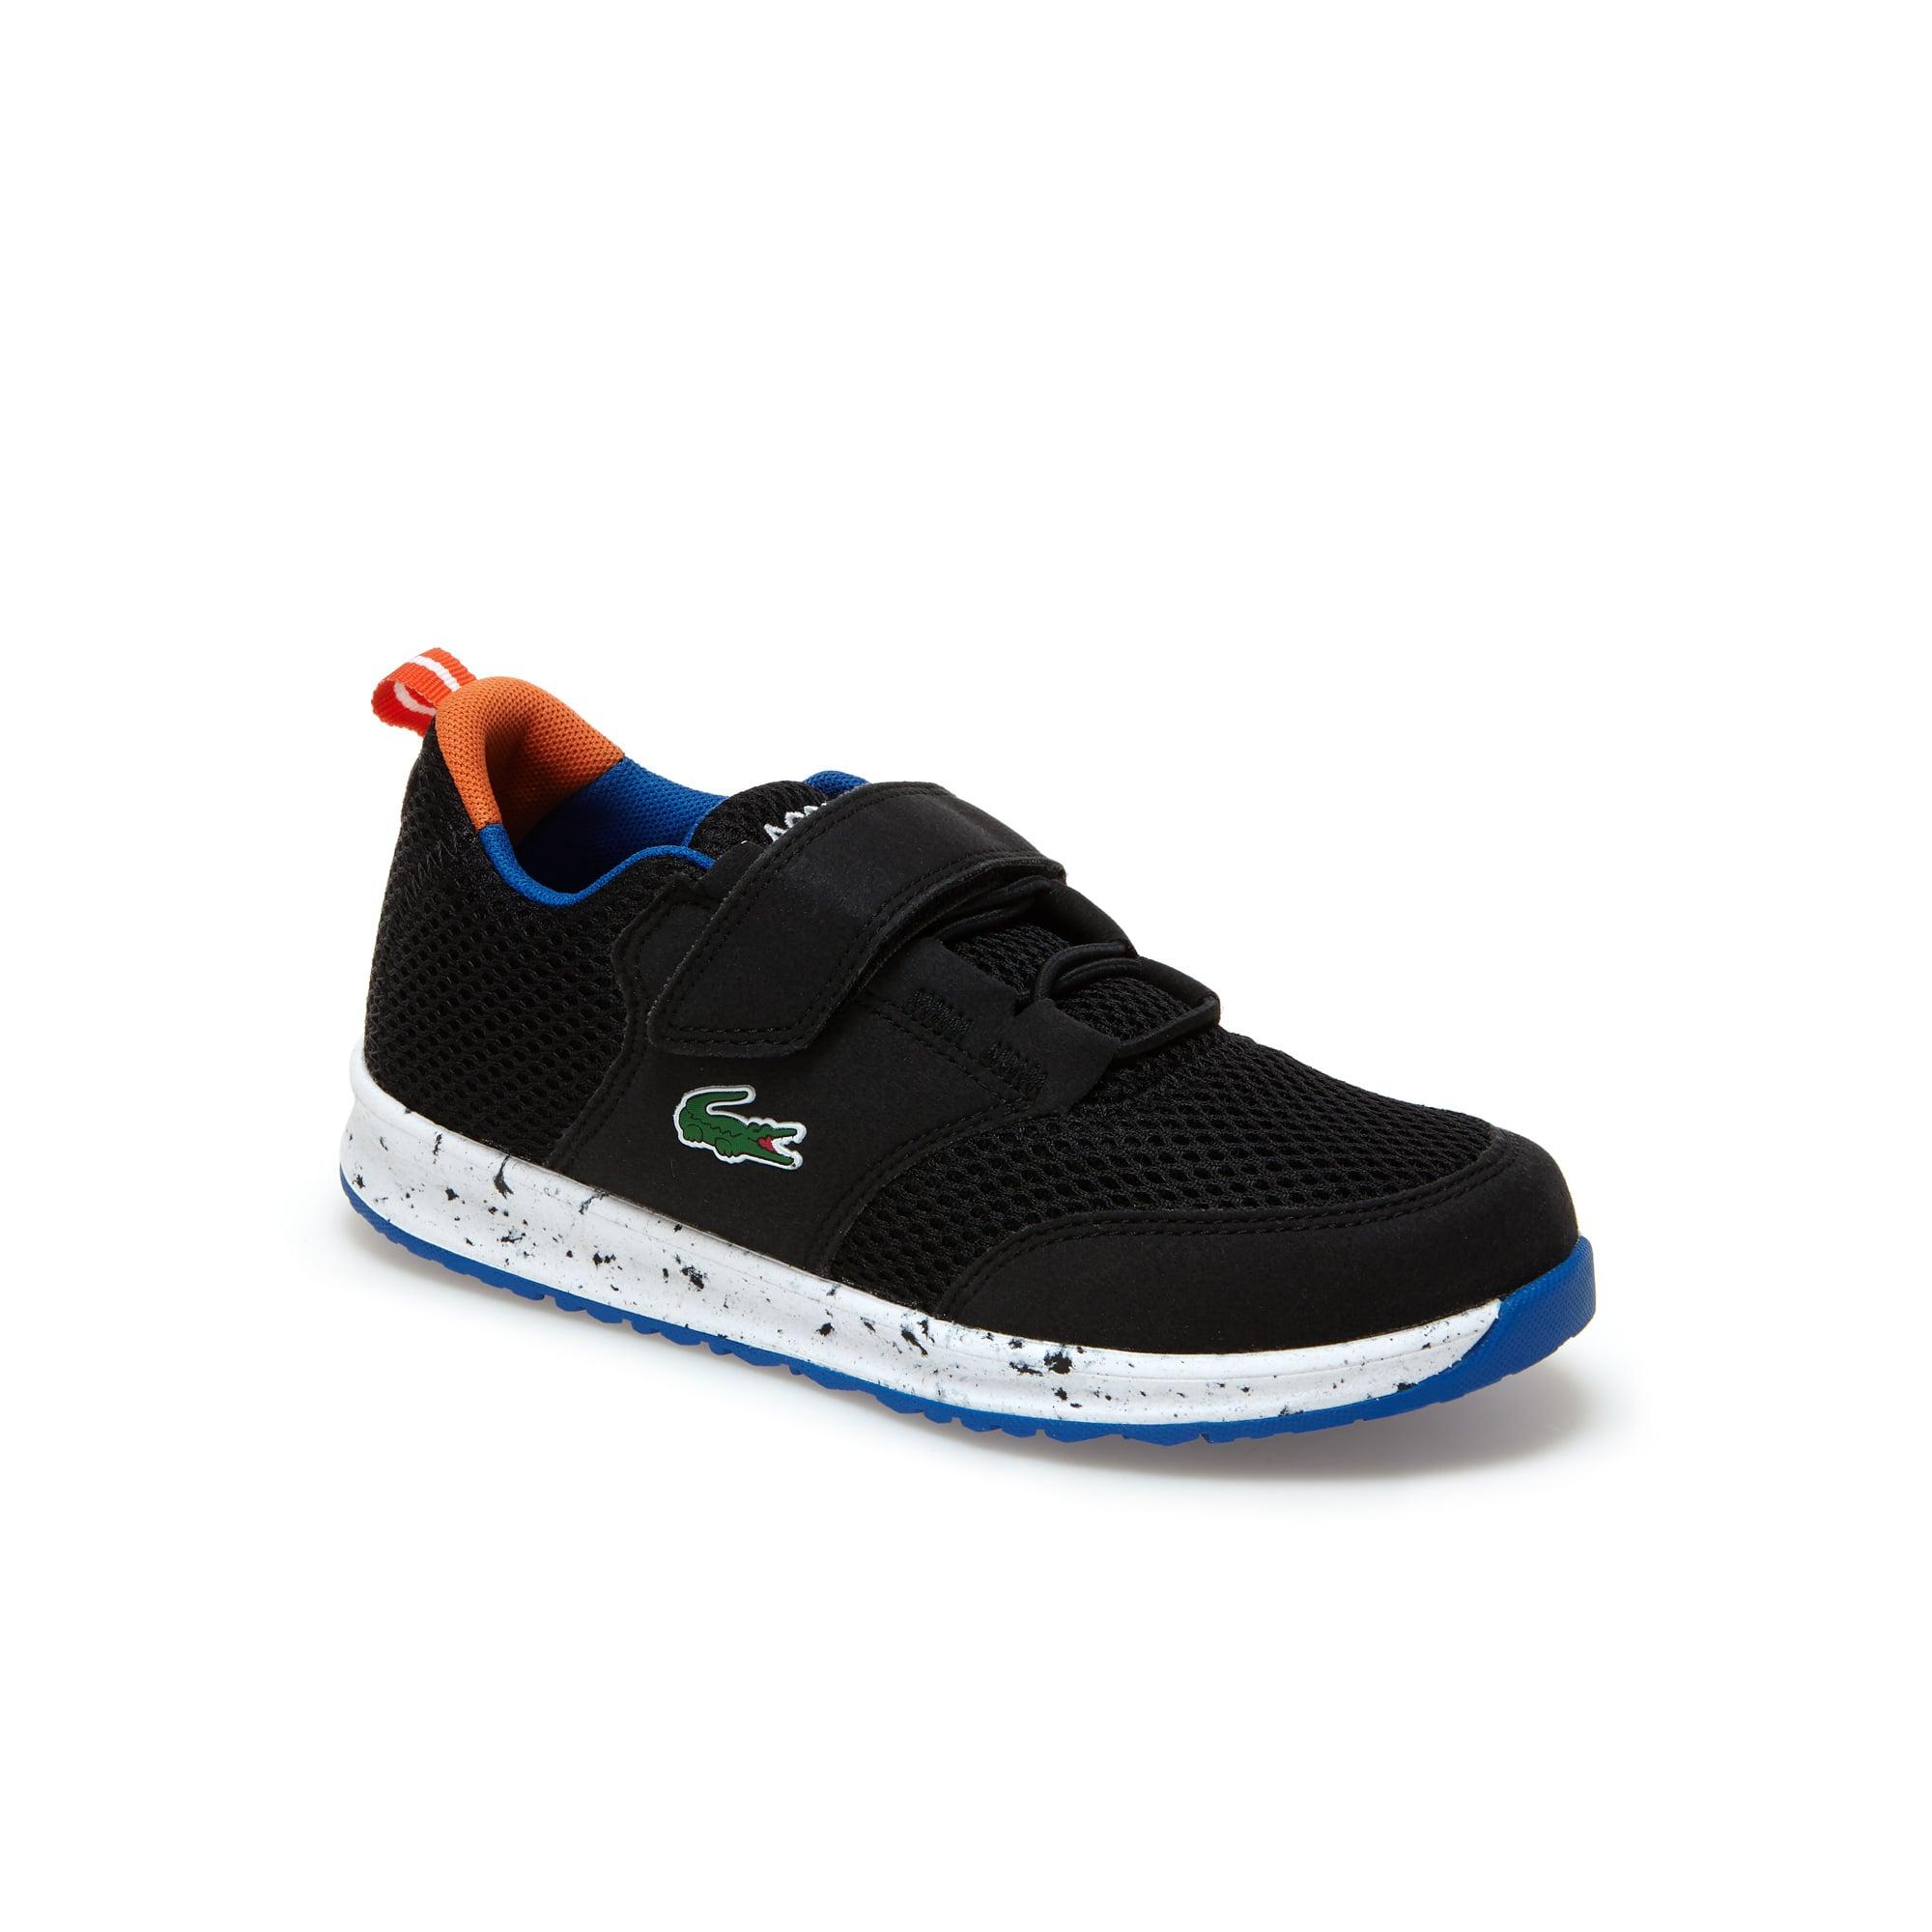 Kinder-Sneakers L.IGHT aus Stoff und Material in Veloursleder-Optik